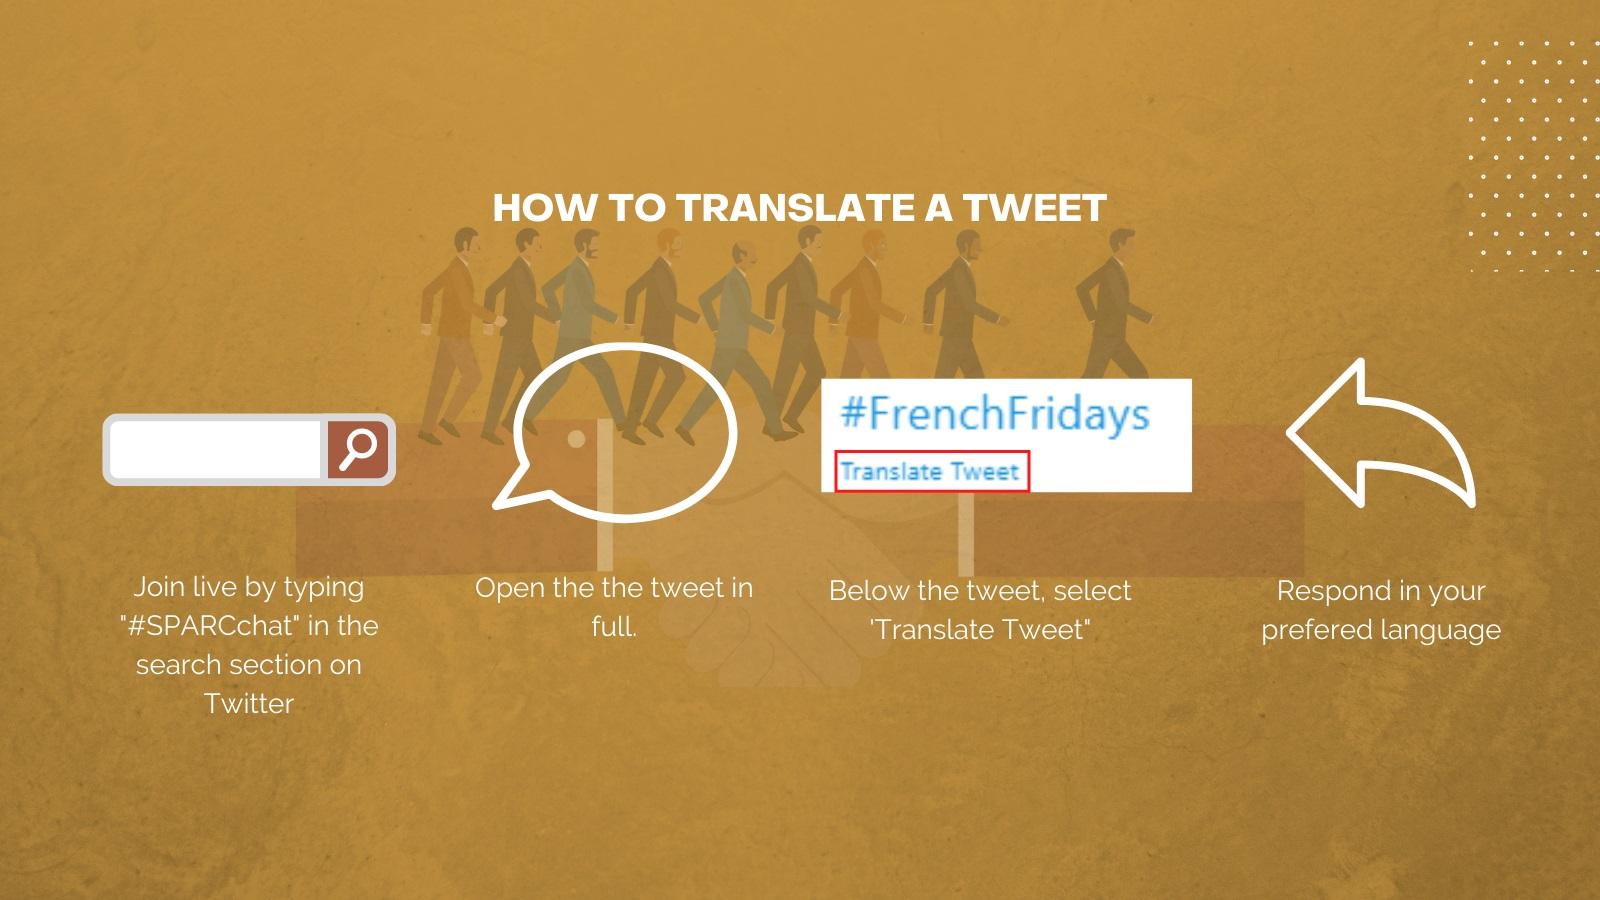 Translating a Tweet